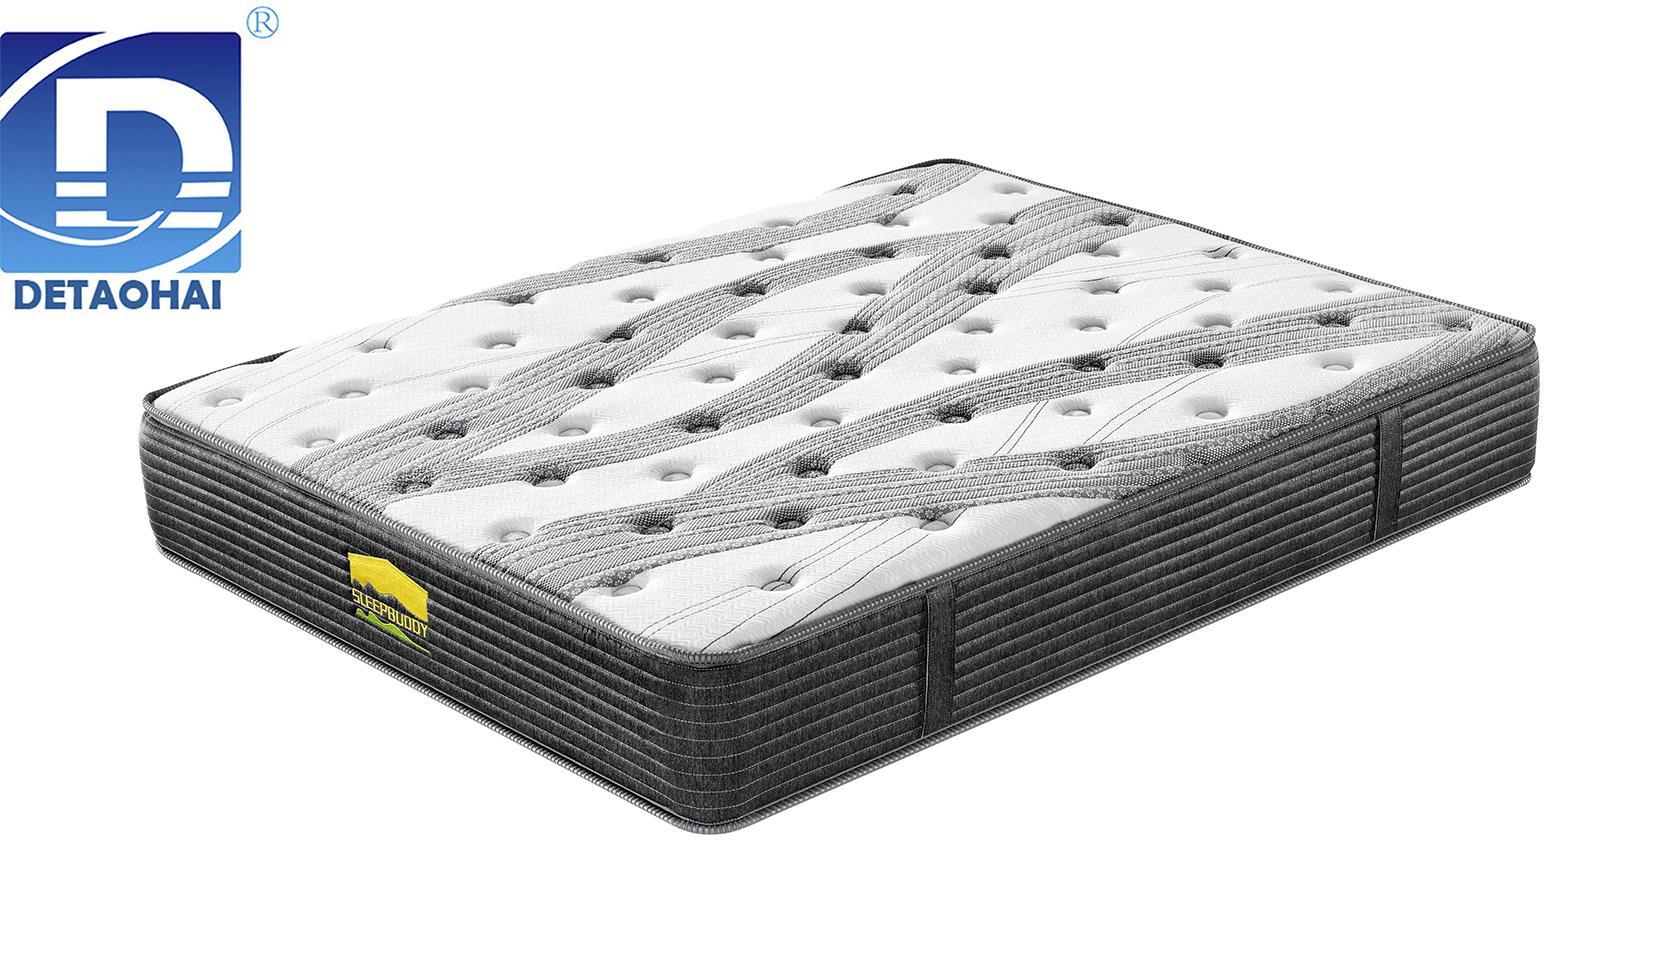 comfortable pocket spring memory foam mattress with pattern 1